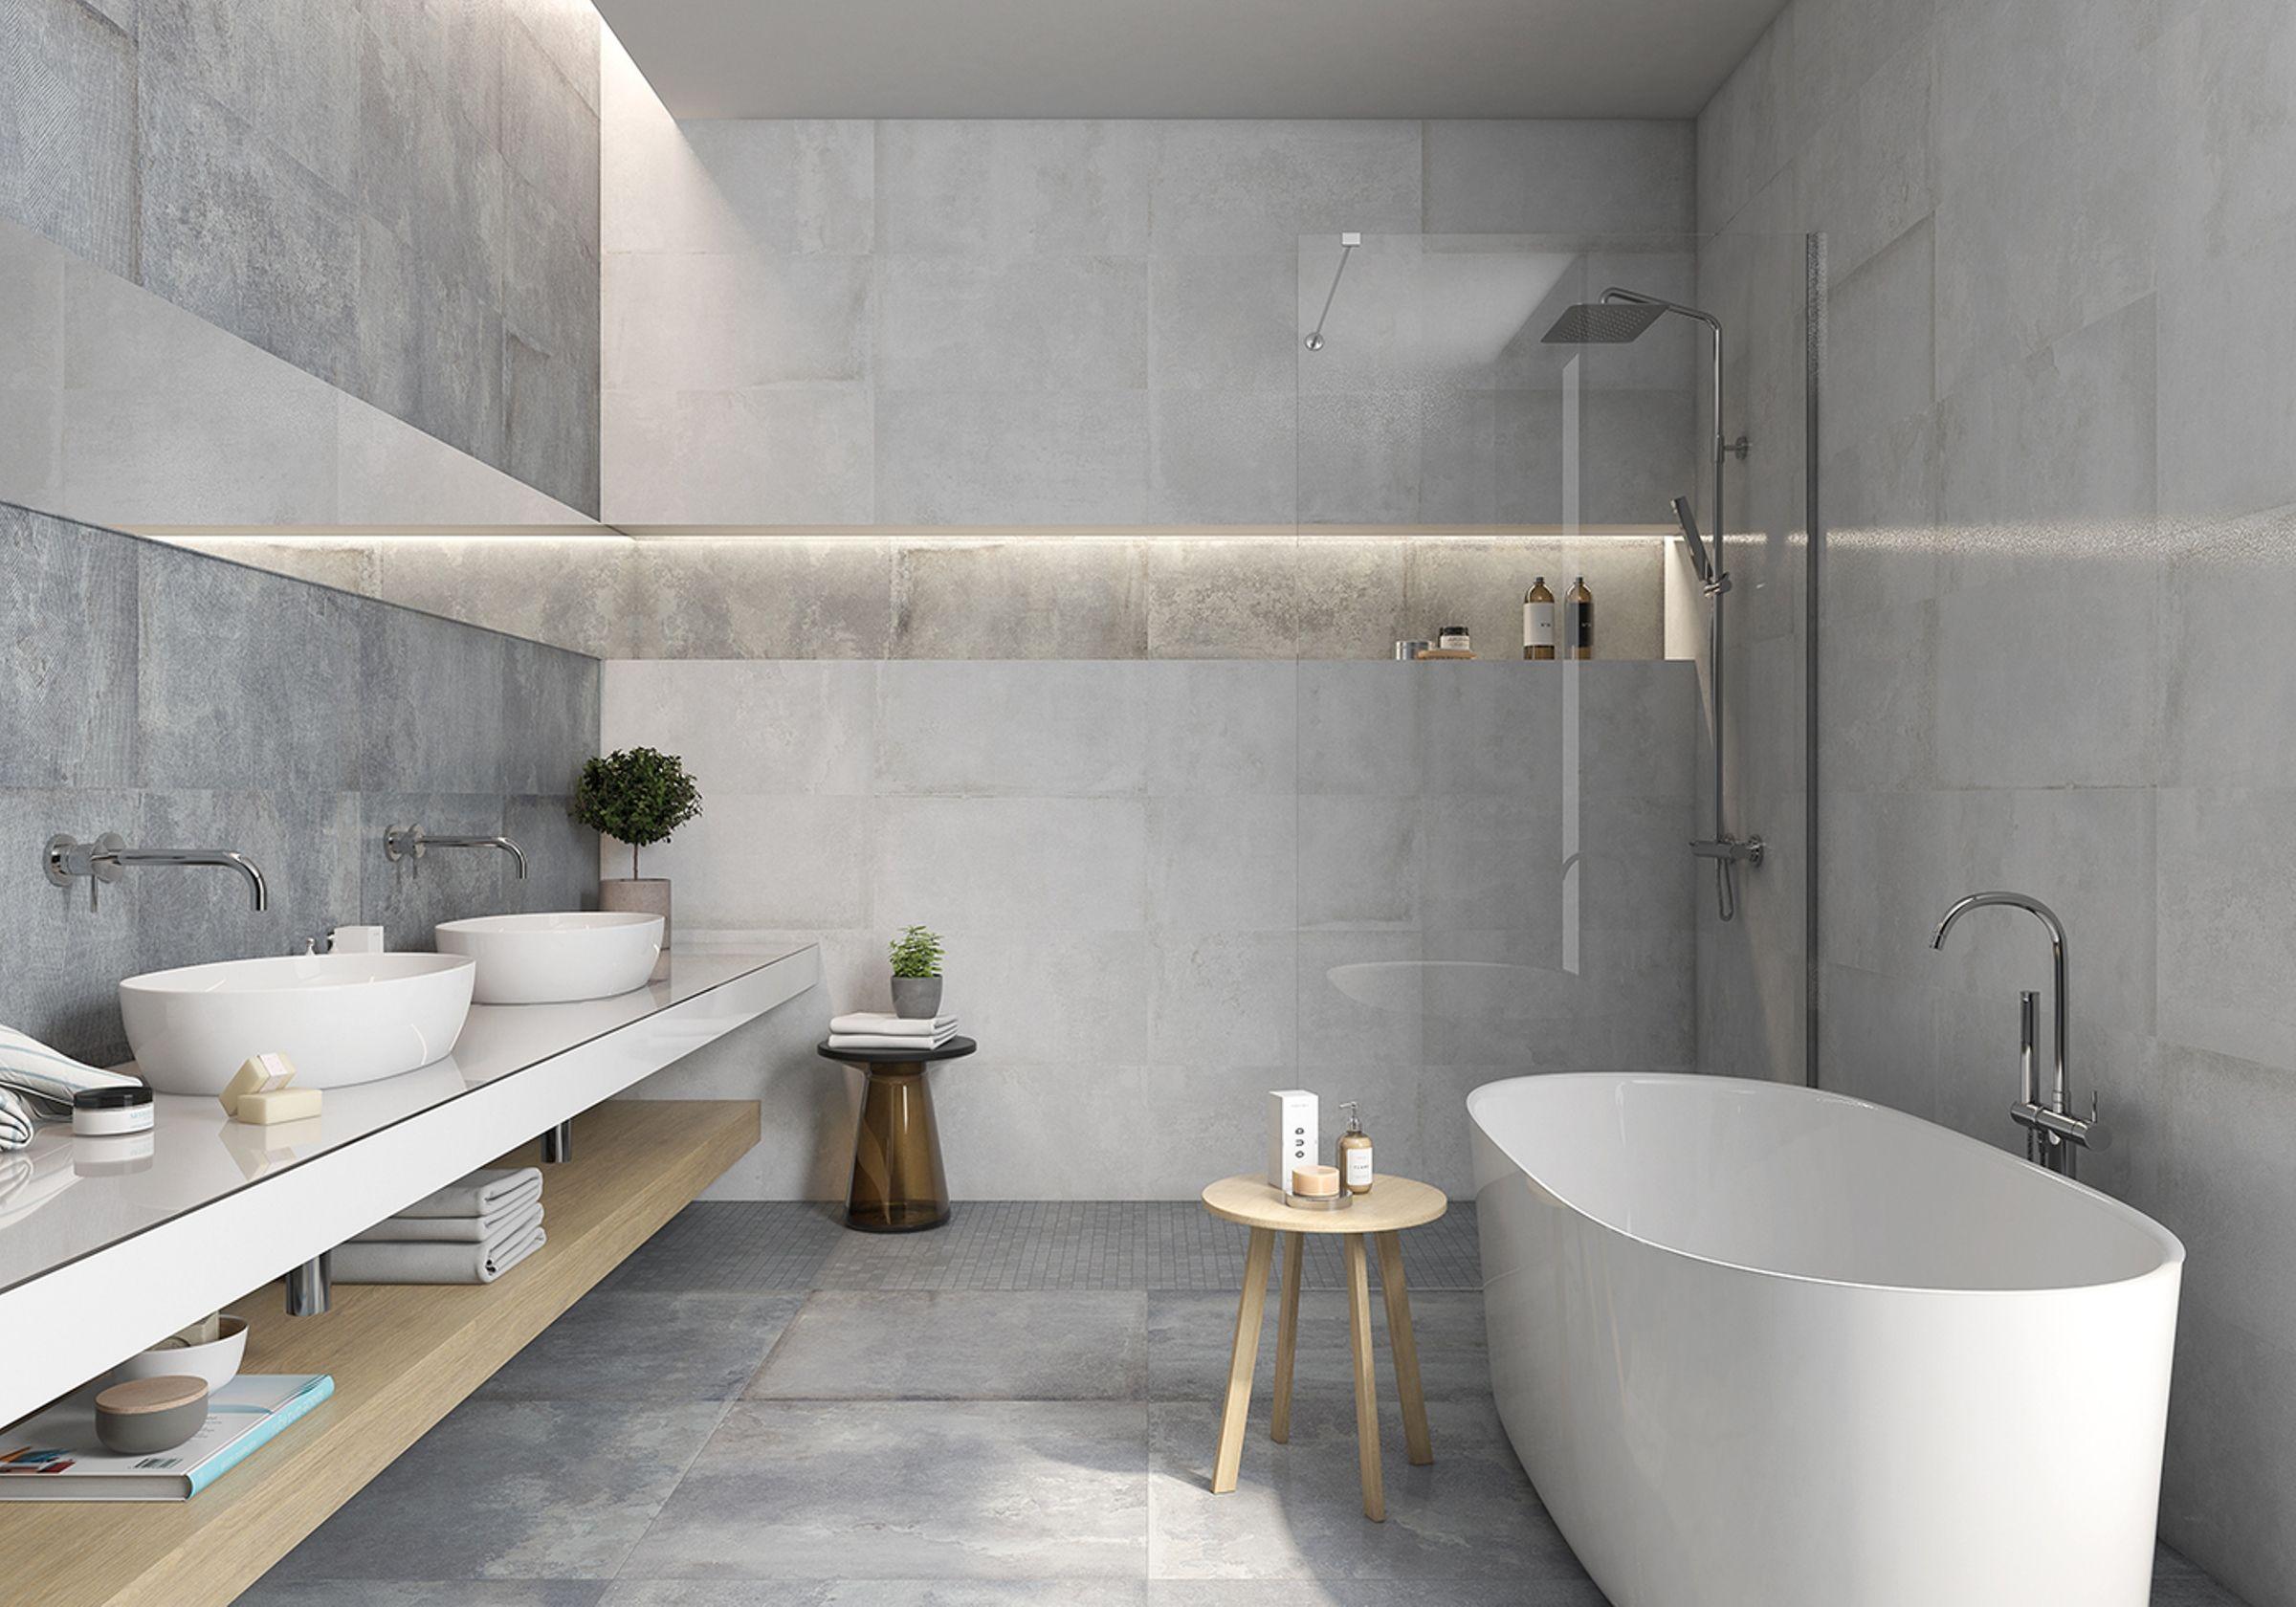 Keraben Rue De Paris Variantenreiche Zementoptik In 2020 Dusche Fliesen Bad Inspiration Badezimmer Dekor